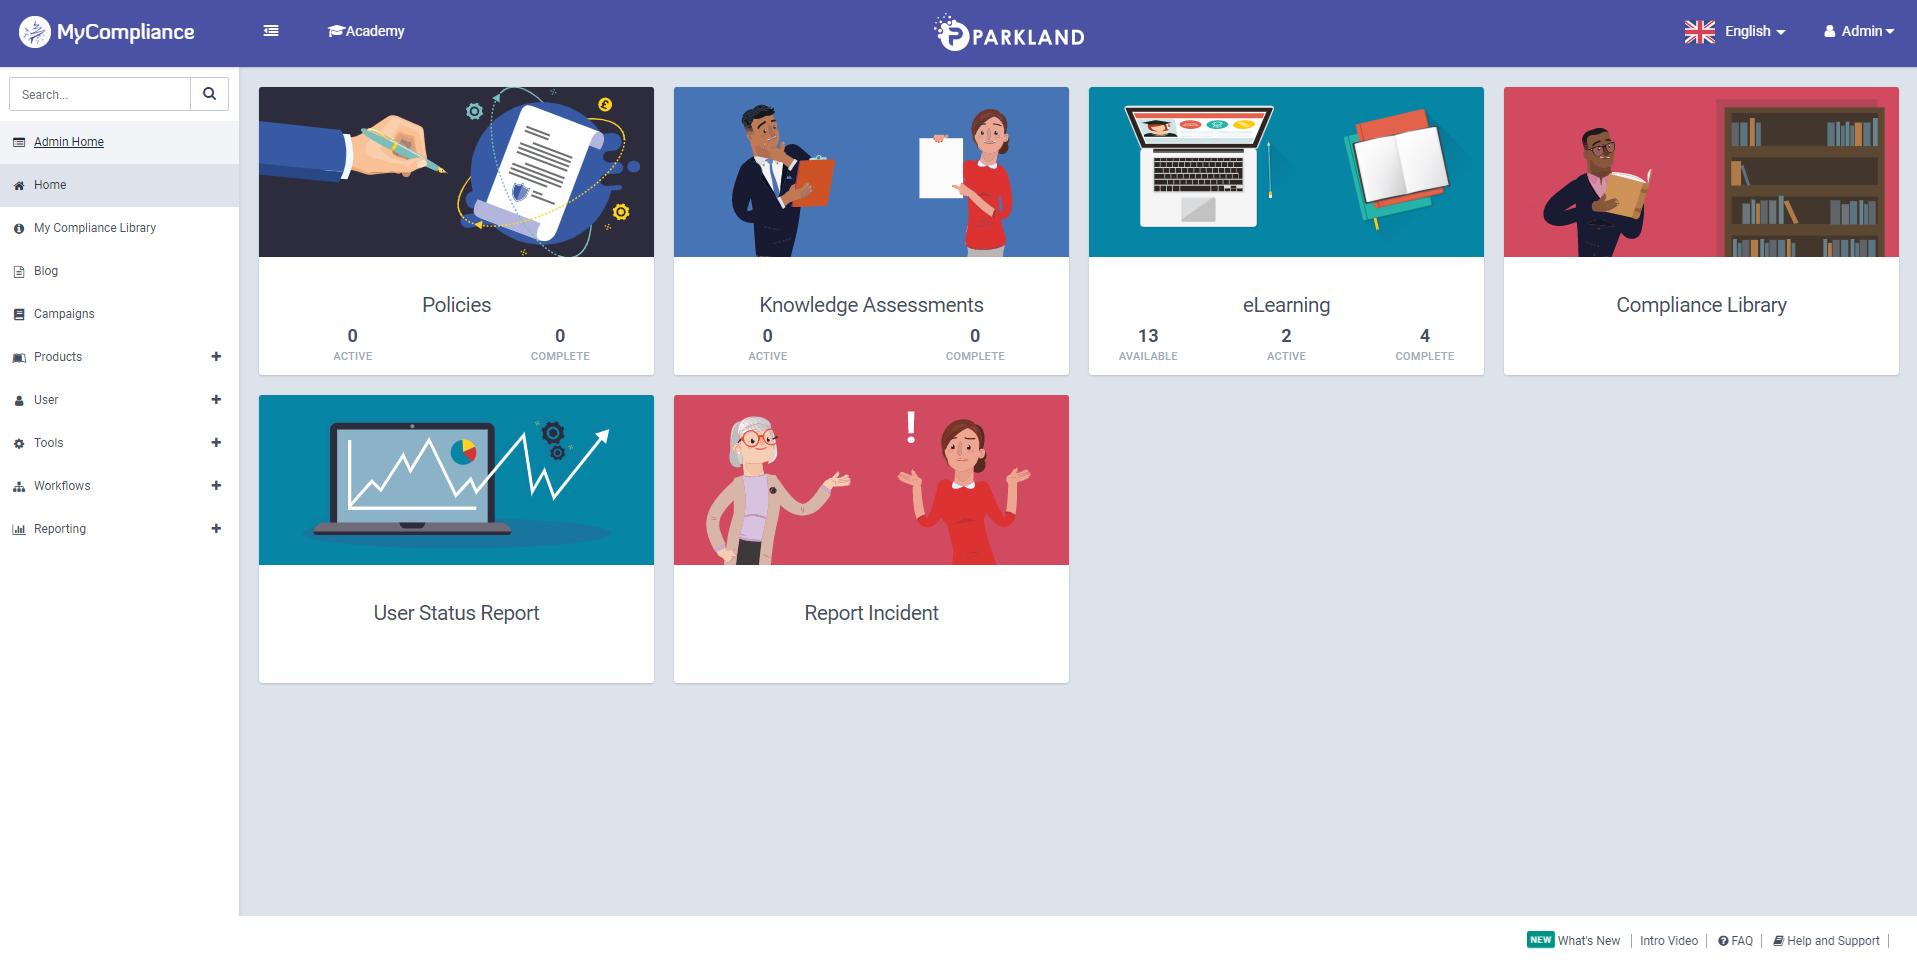 MetaCompliance Software - MyCompliance Homepage